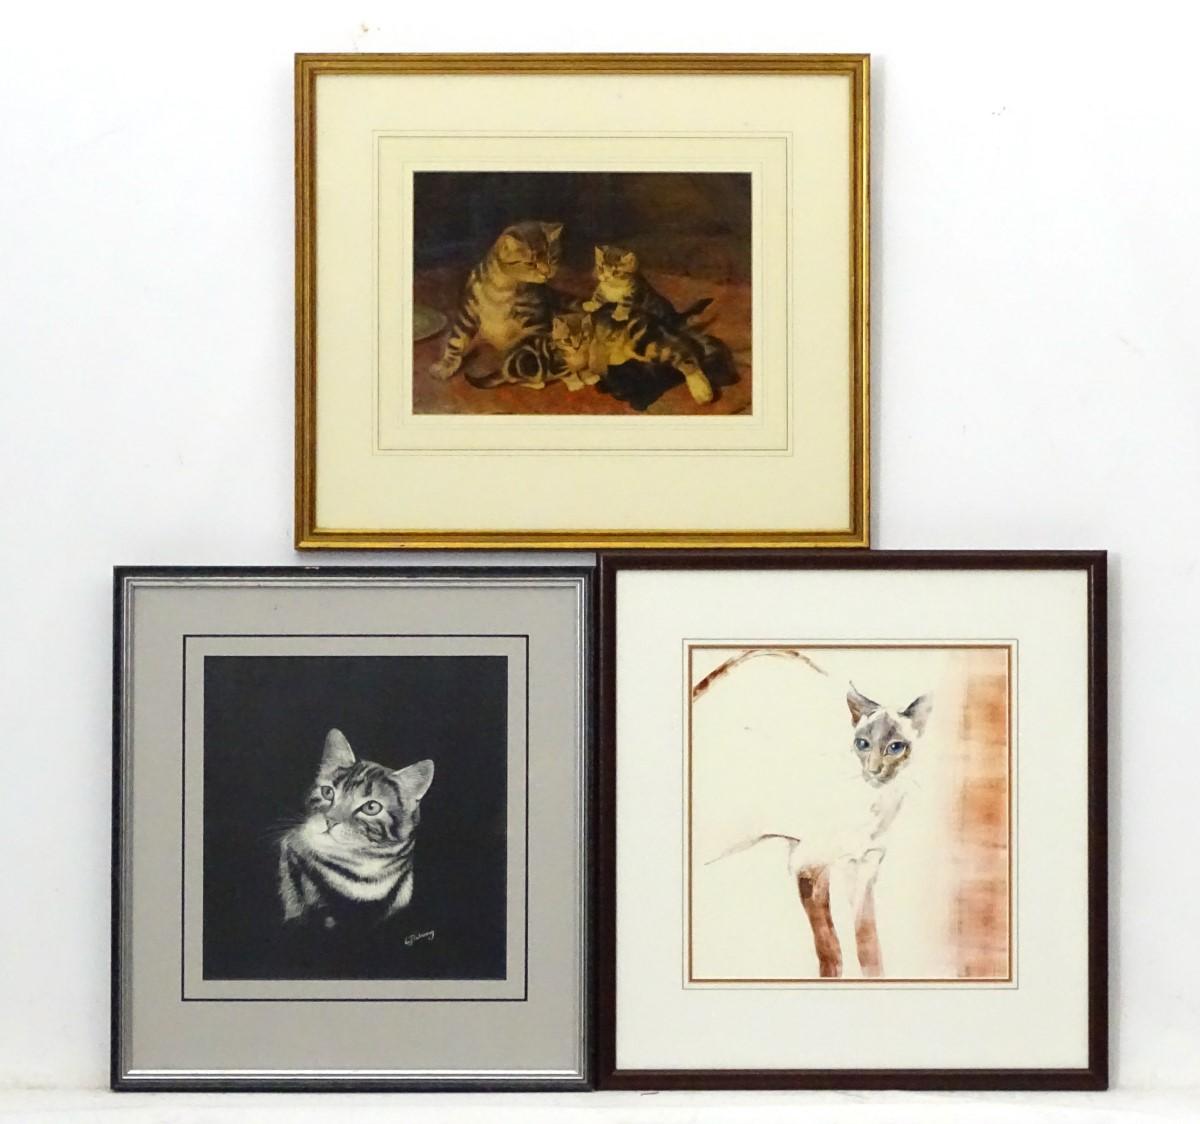 Lot 3 - Cats x 3, L J Waring, Scraper board, Facsimile signed Chromolithograph,